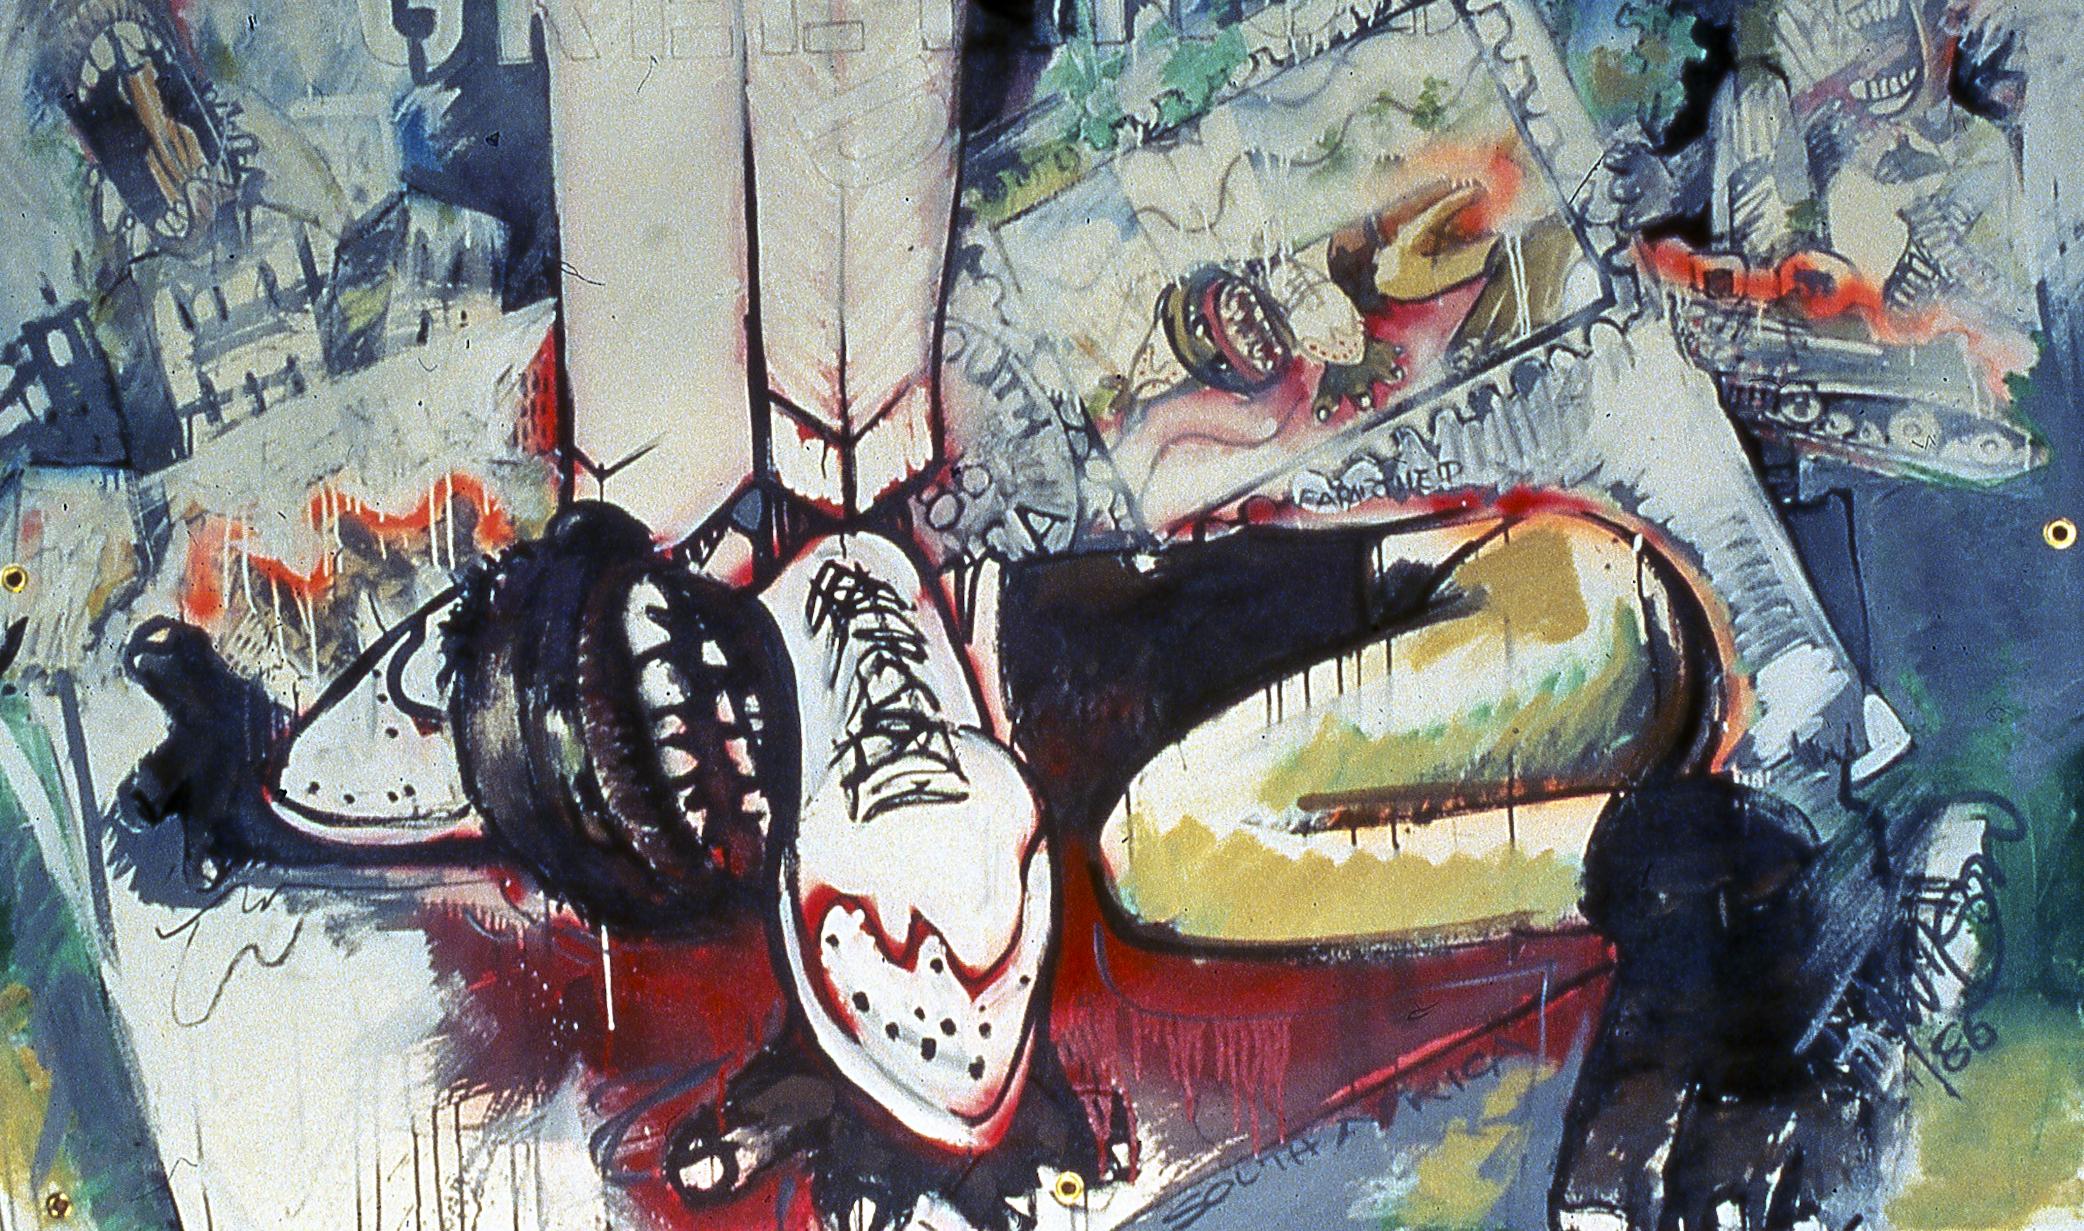 Greetings Acrylic on canvas 48x72 (122x183 cm) 1985